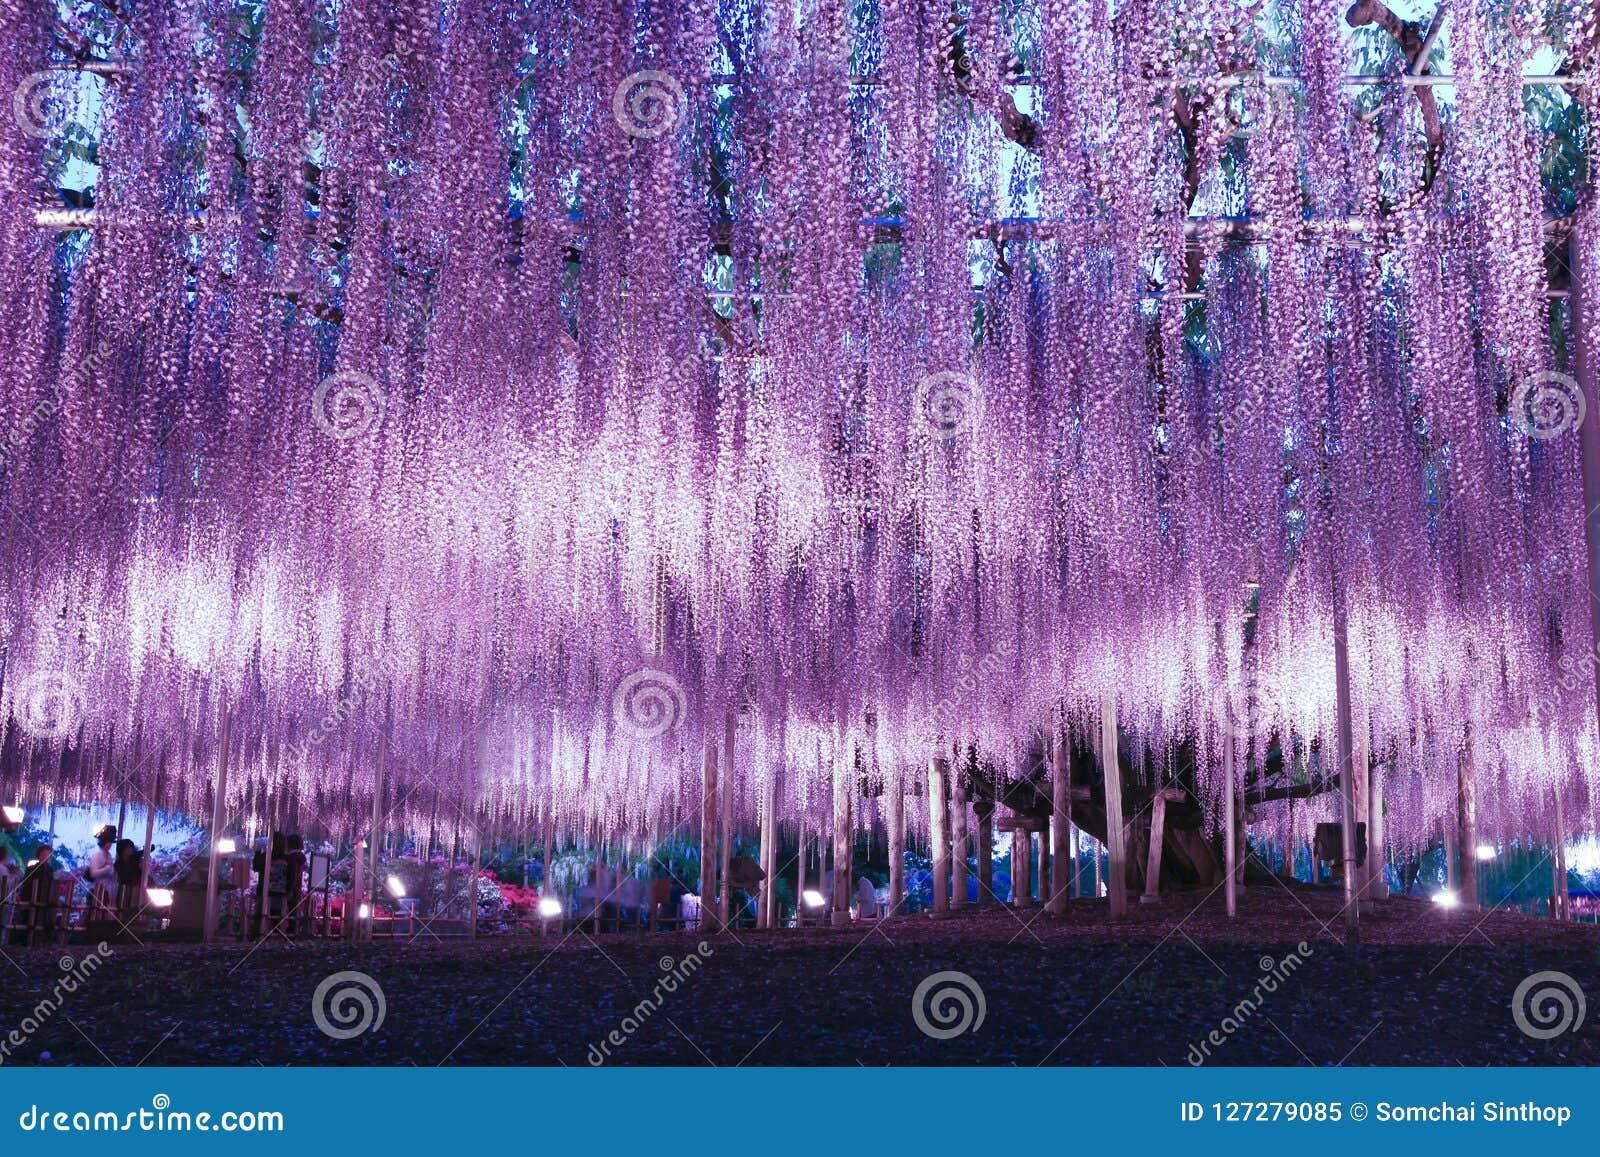 Wisteria illumination in Ashikaga Flower Park